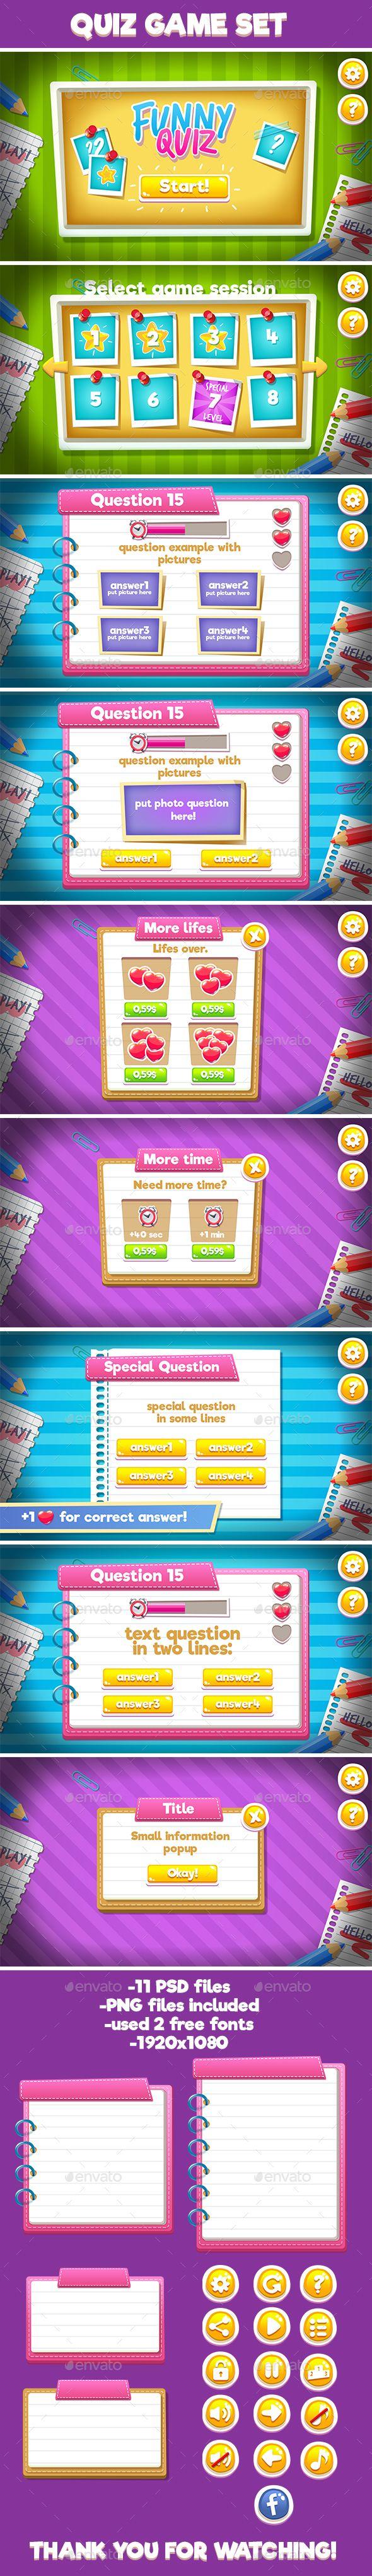 Quiz Full Game Set - User Interfaces Game Assets